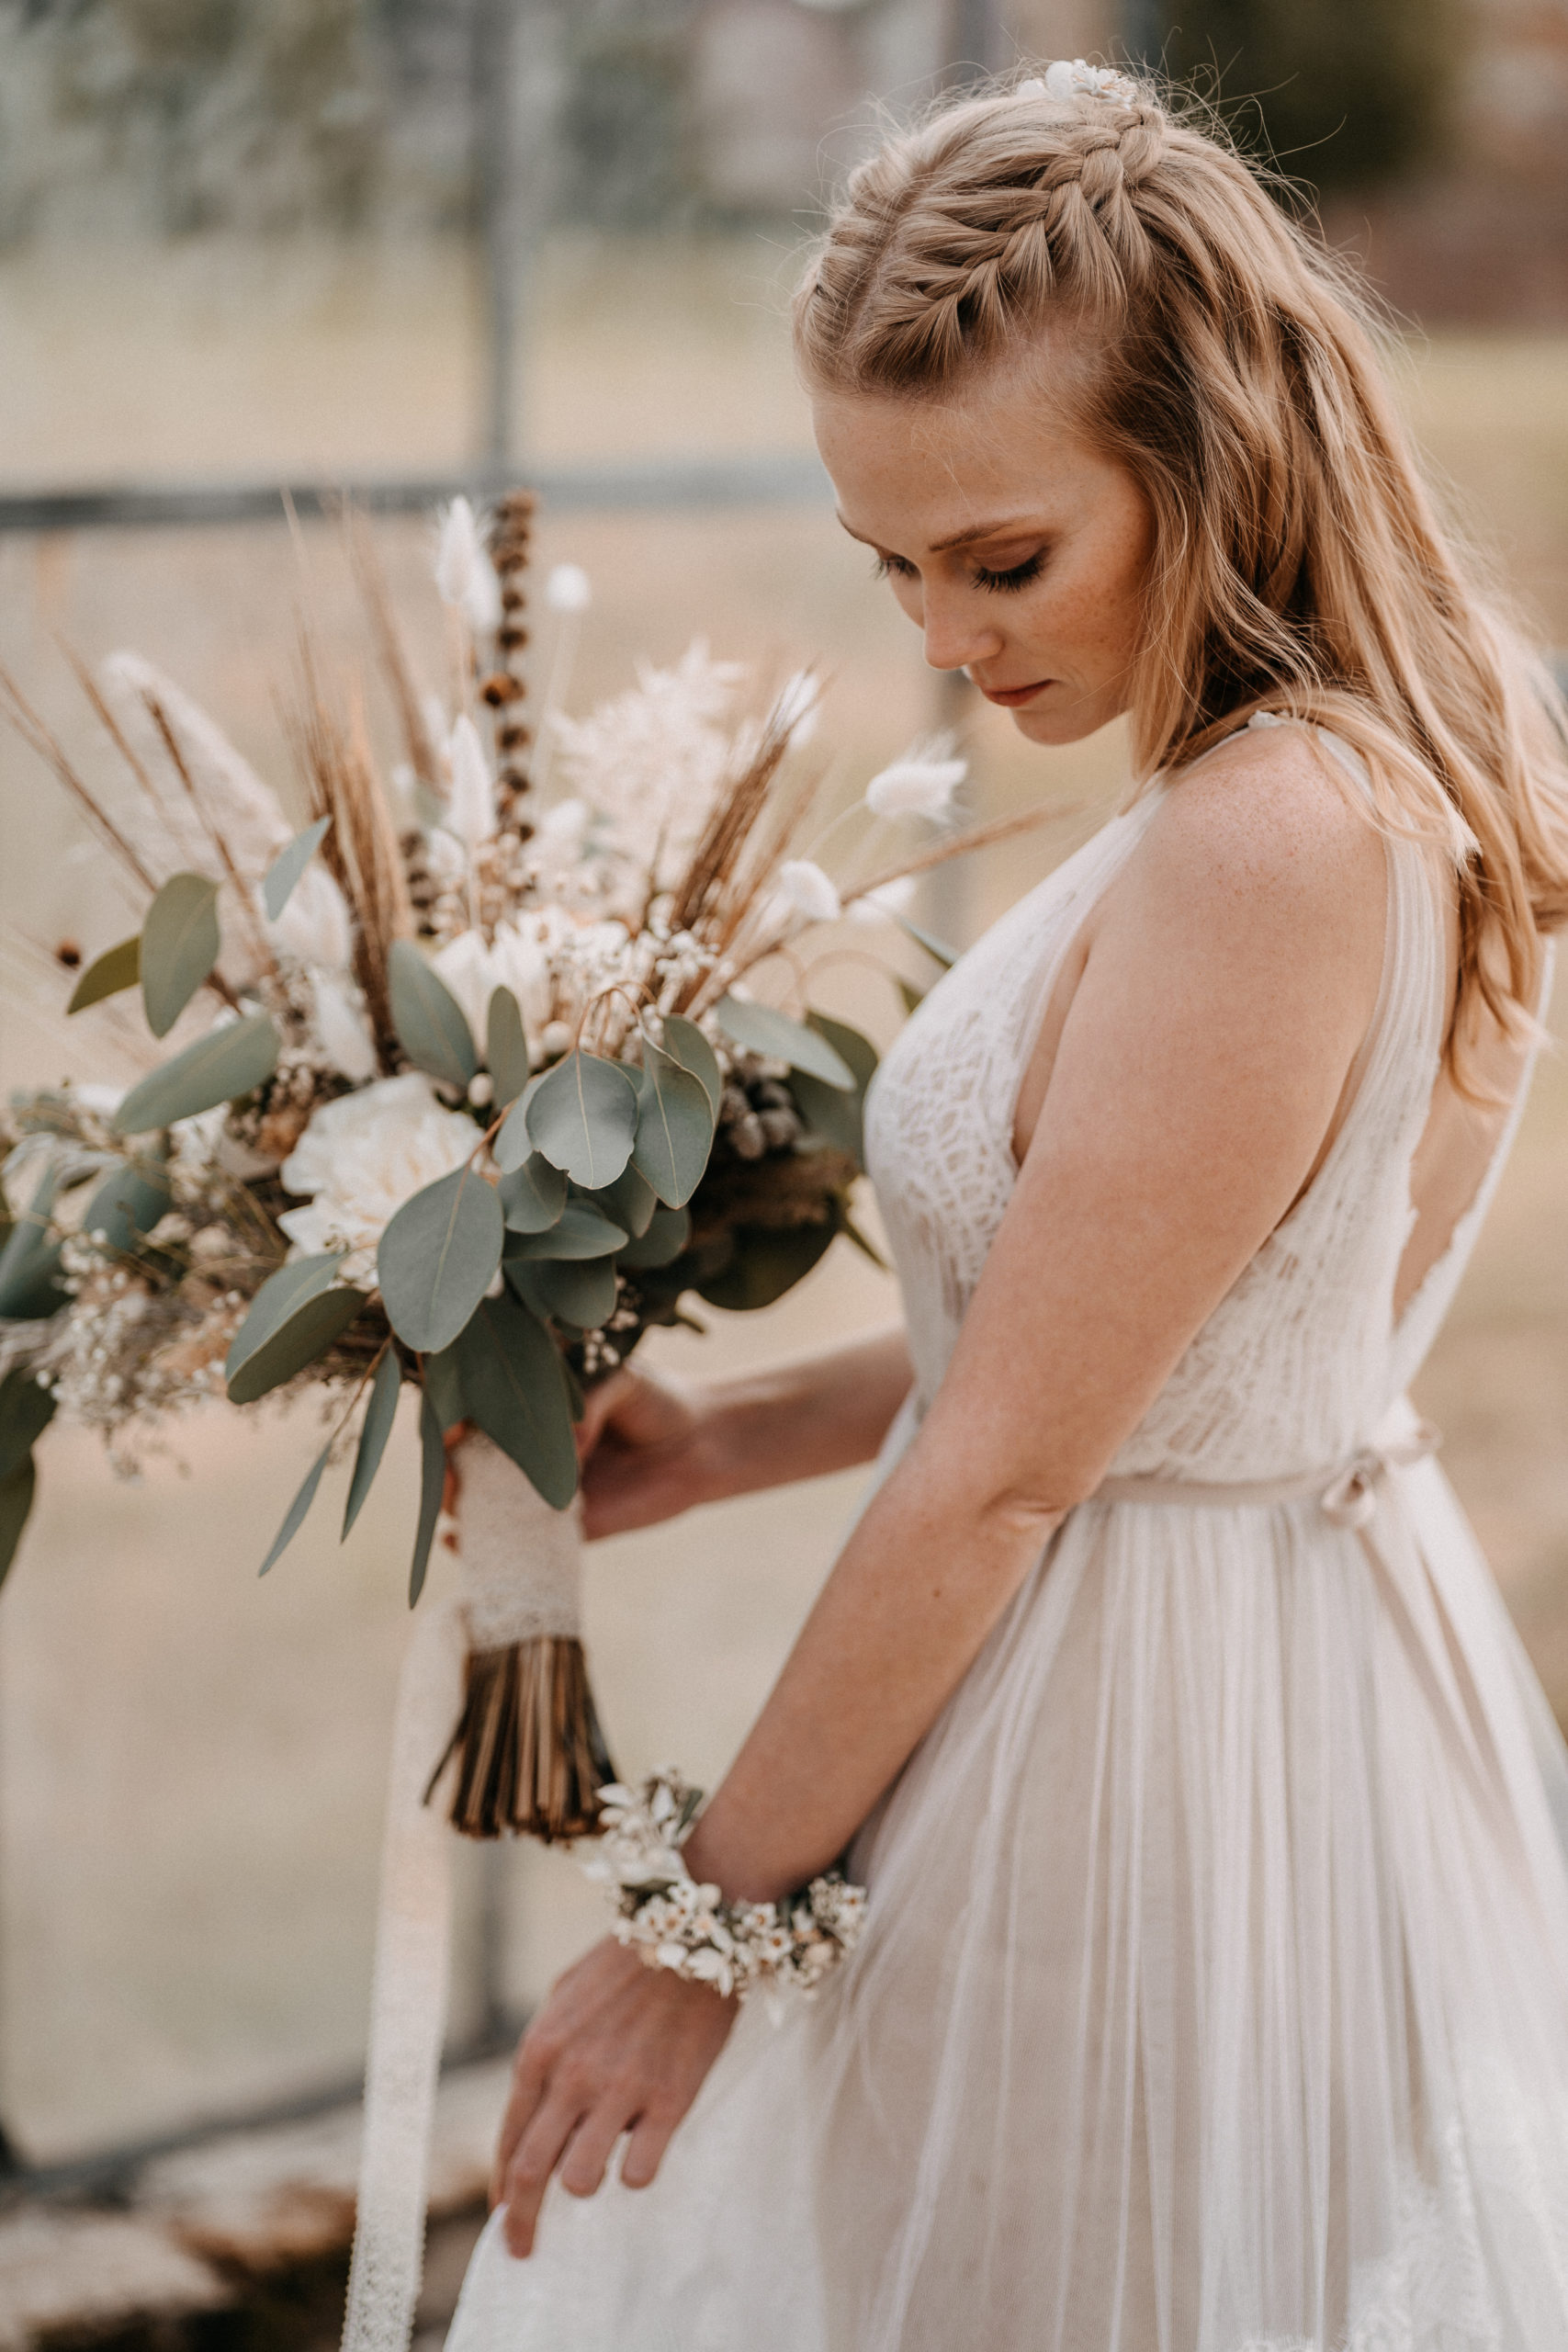 Vintage Brautkleider bei Jenari – Bridal Concept Store